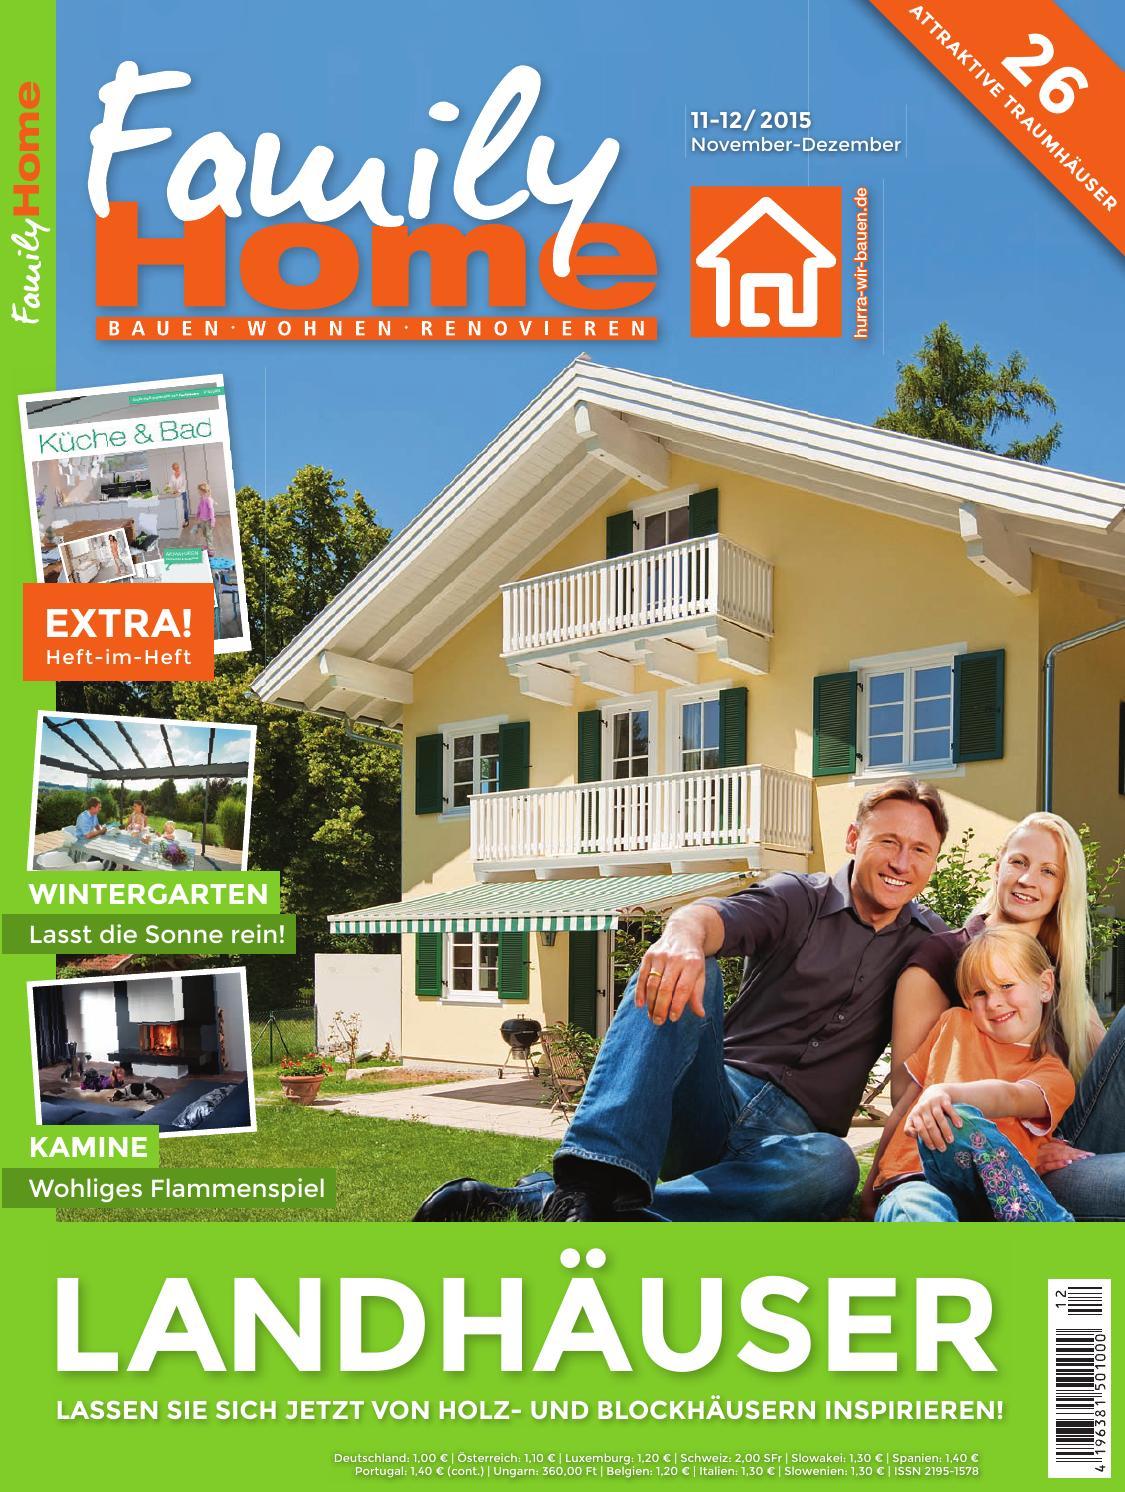 FamilyHome 11/12 2015 by Family Home Verlag GmbH - issuu